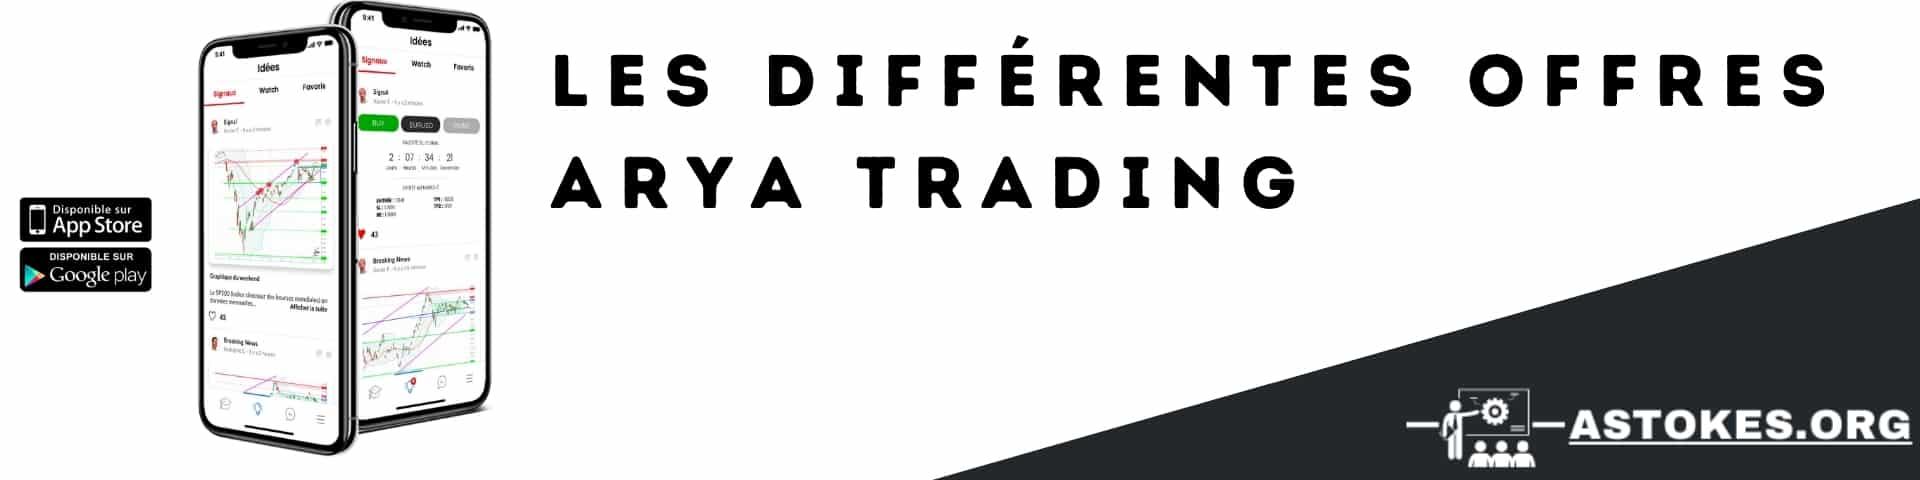 Les différentes offres ARYA Trading